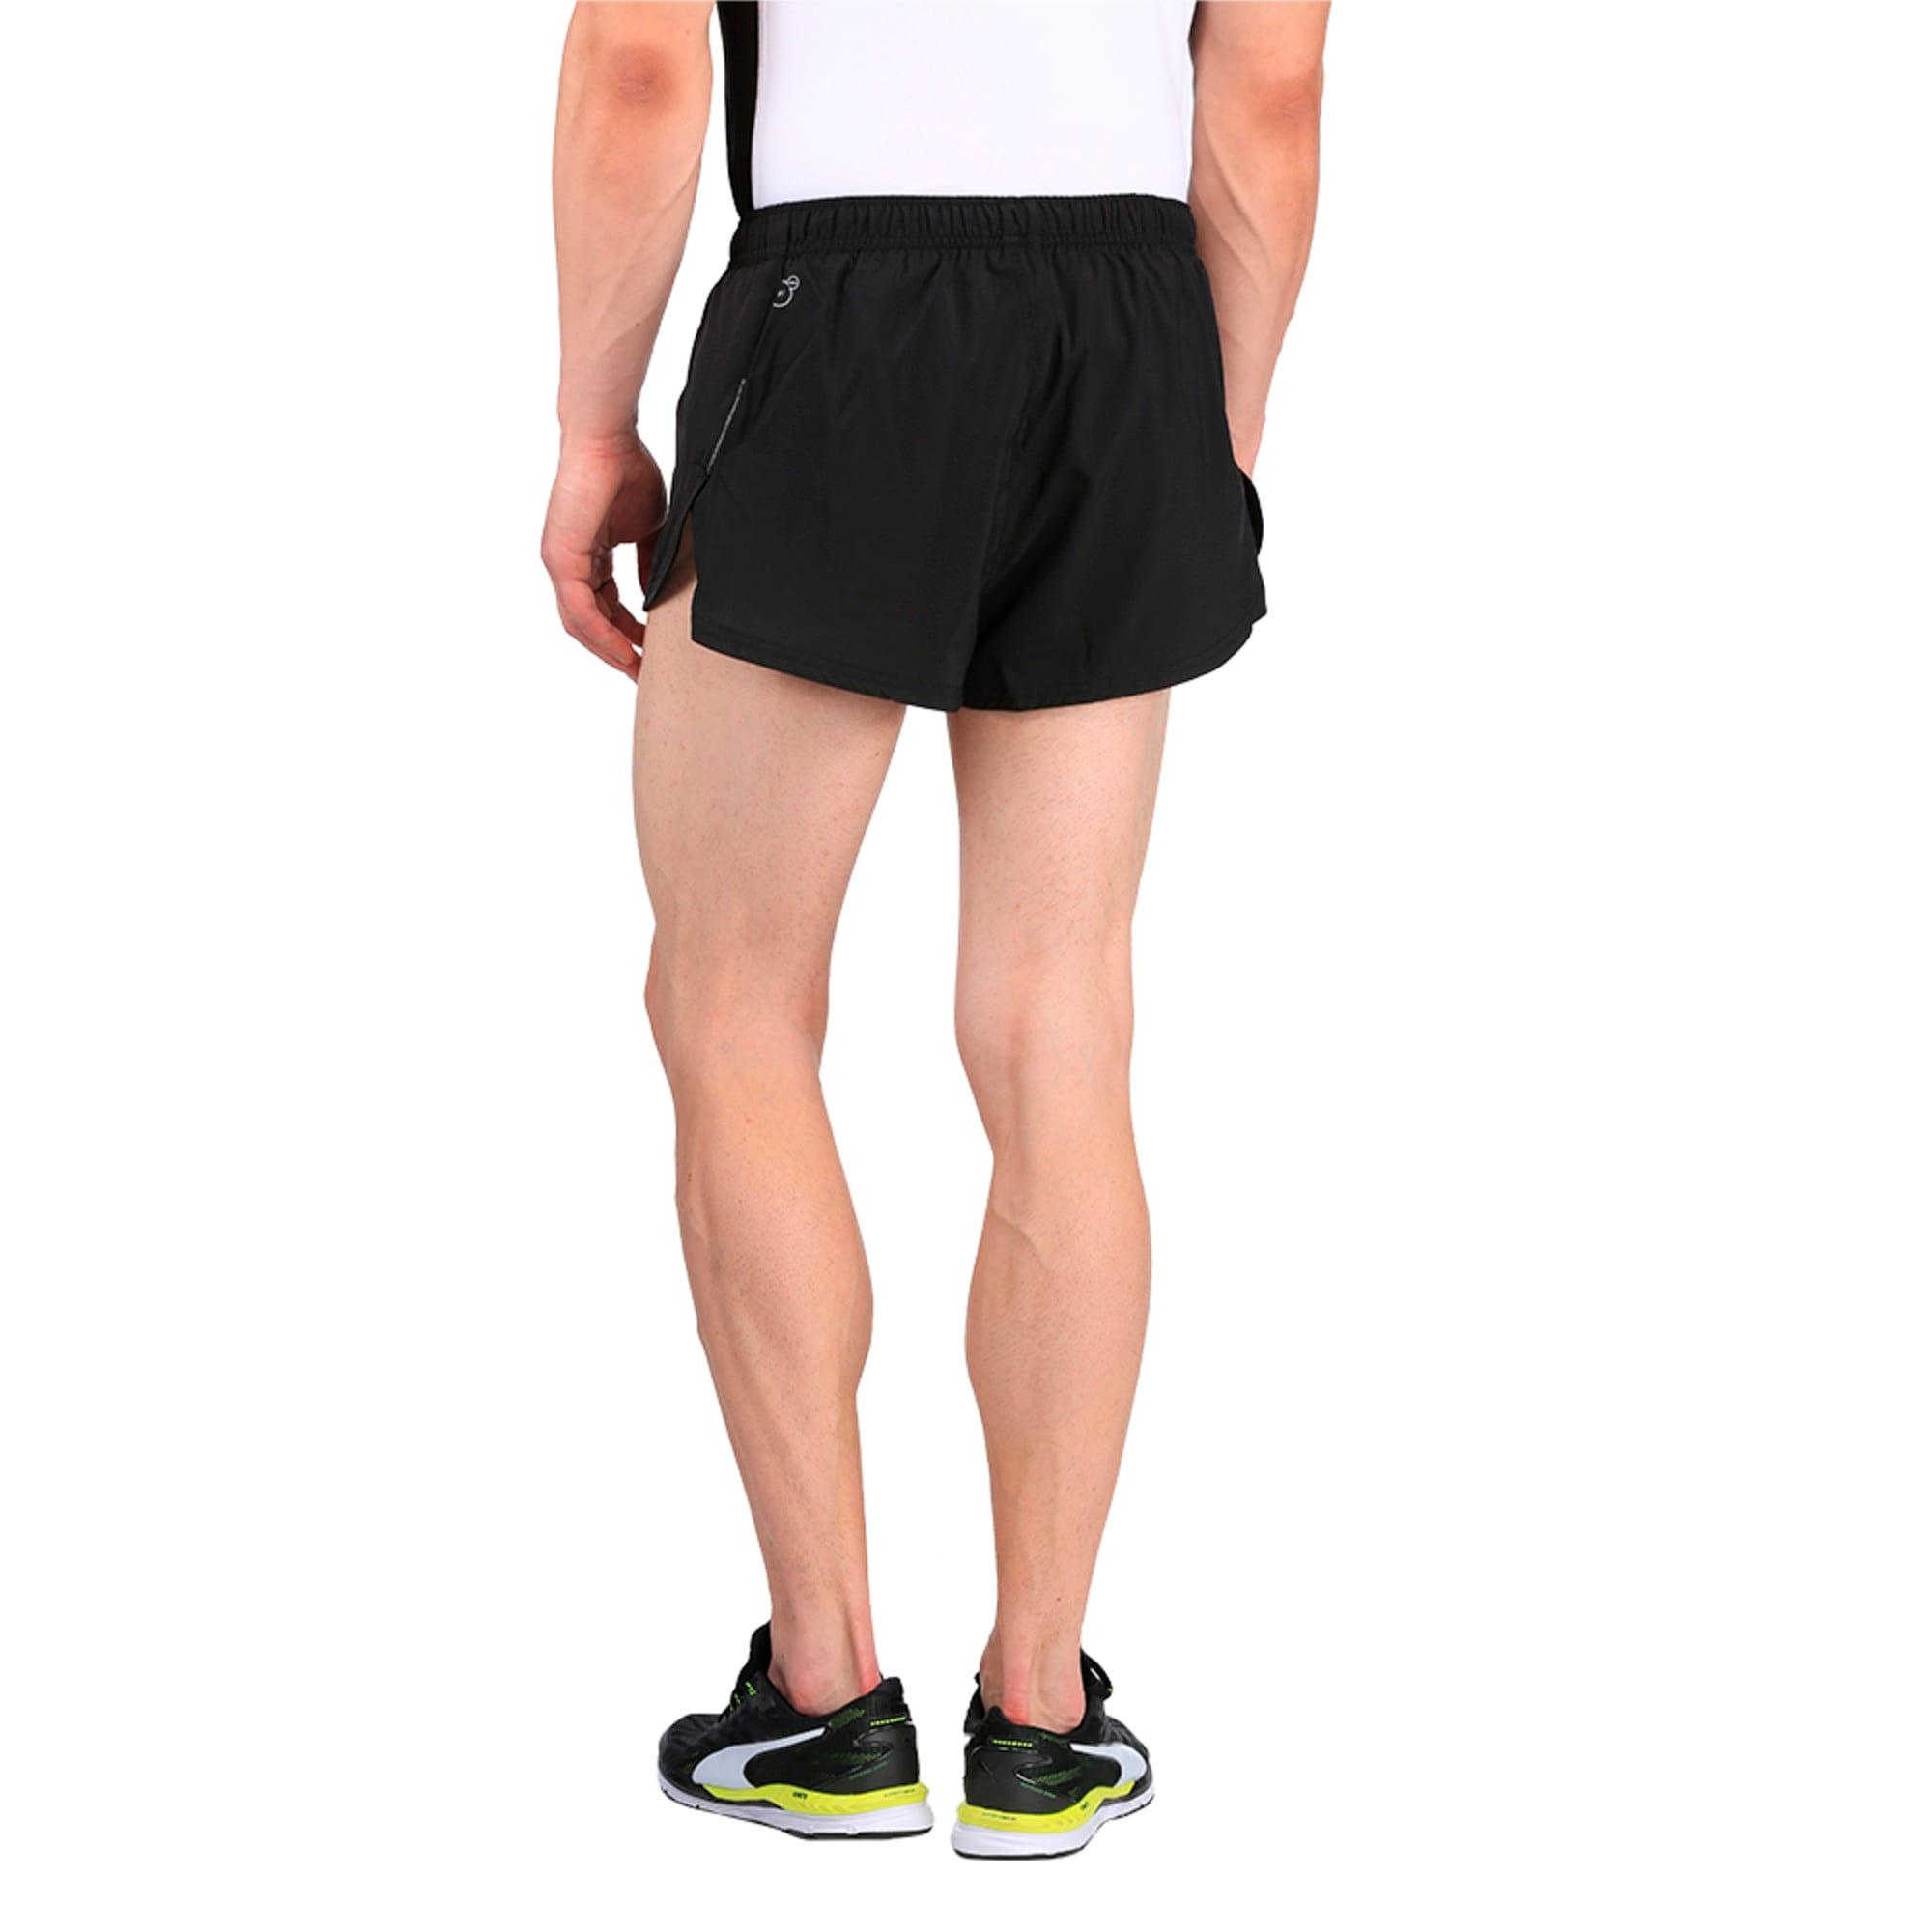 Thumbnail 2 of Running Men's Split Shorts, Puma Black, medium-IND